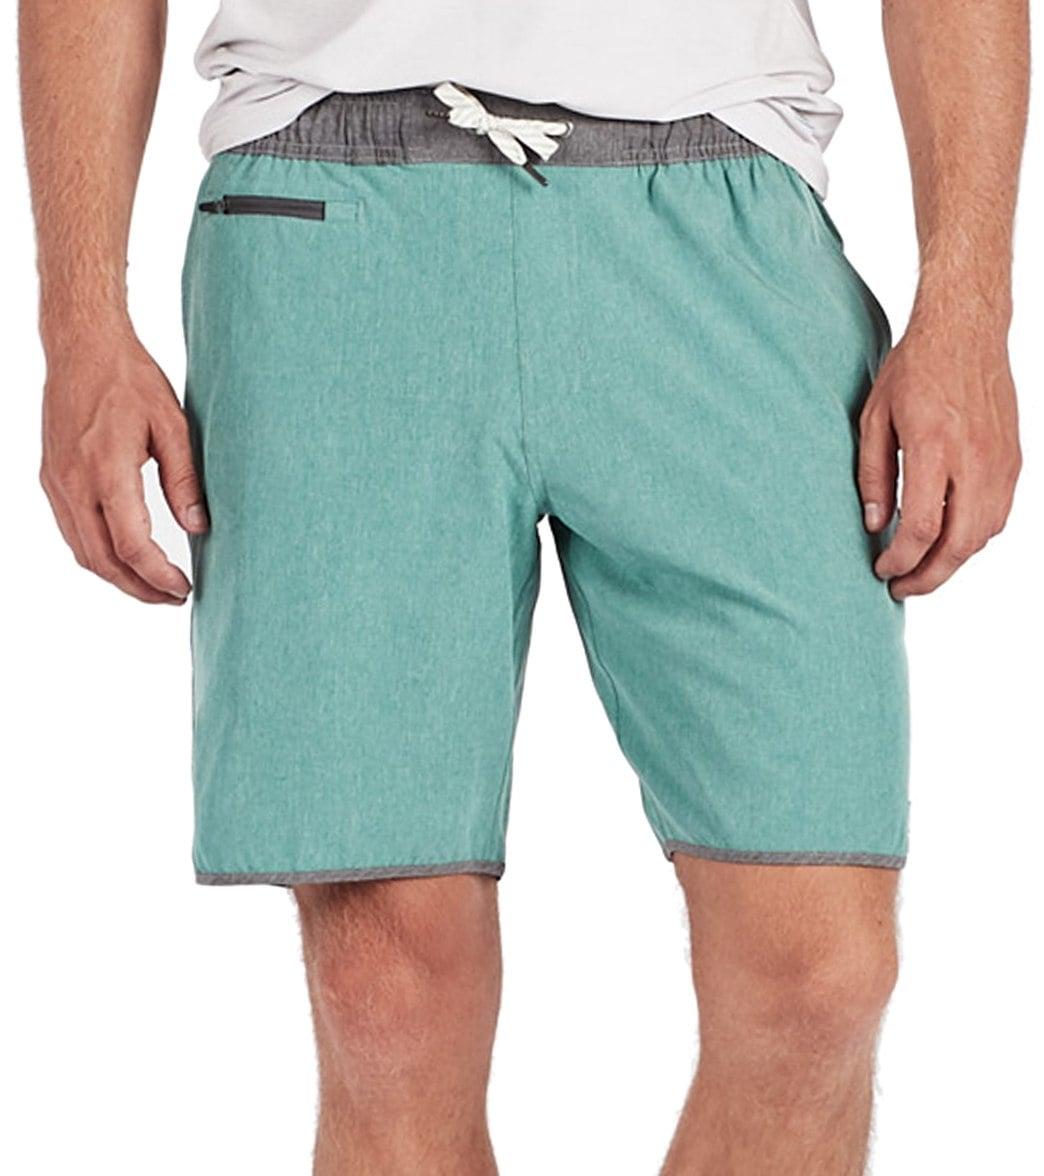 eb2c4258cc813 Vuori Men's Banks Shorts at YogaOutlet.com - Free Shipping